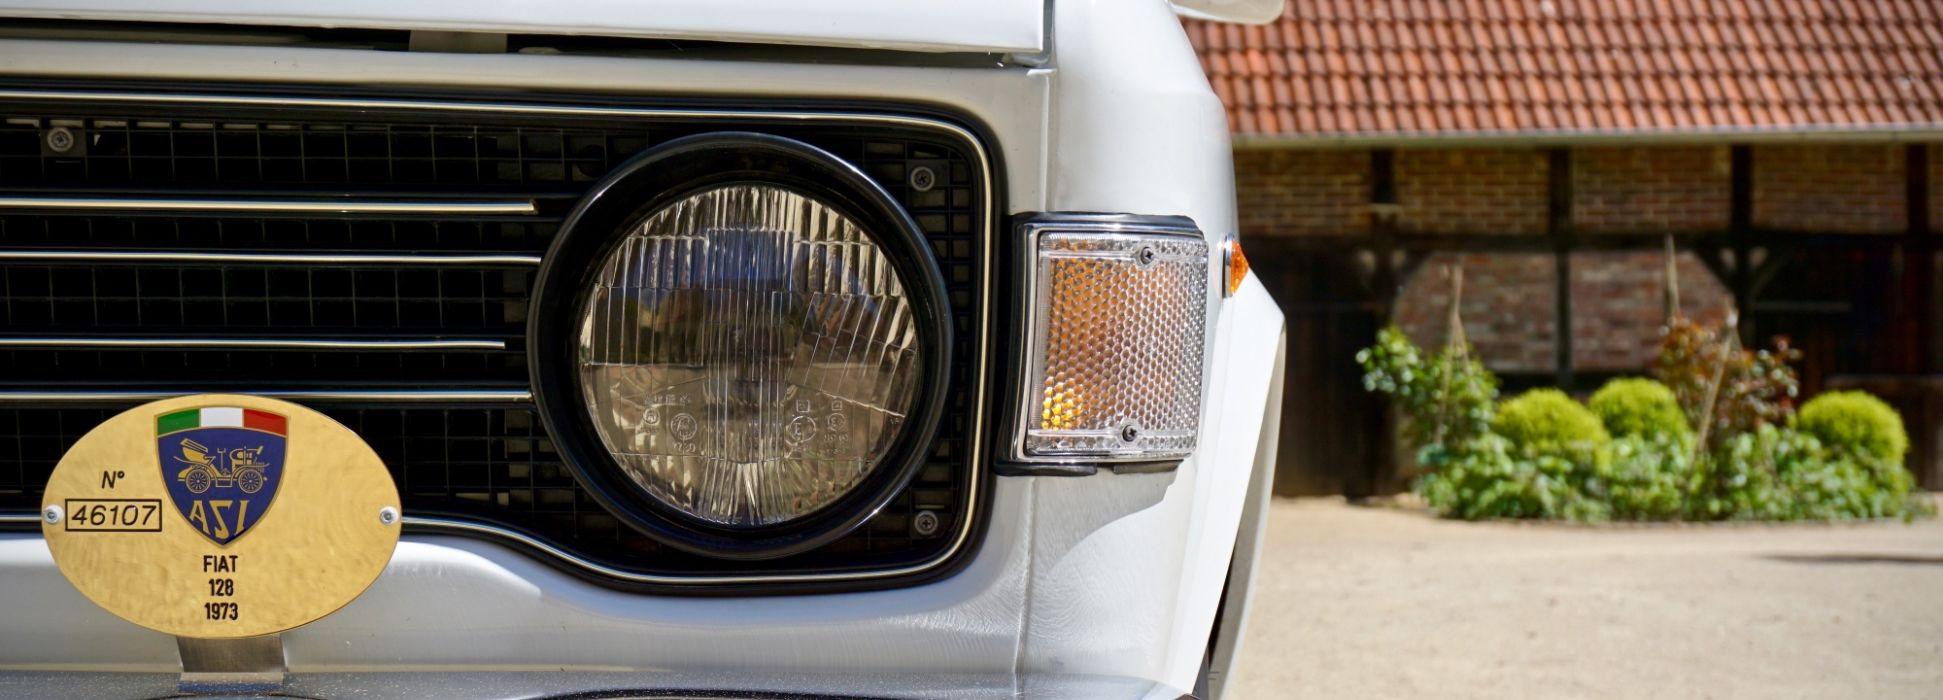 Fiat 128 Berlina 23